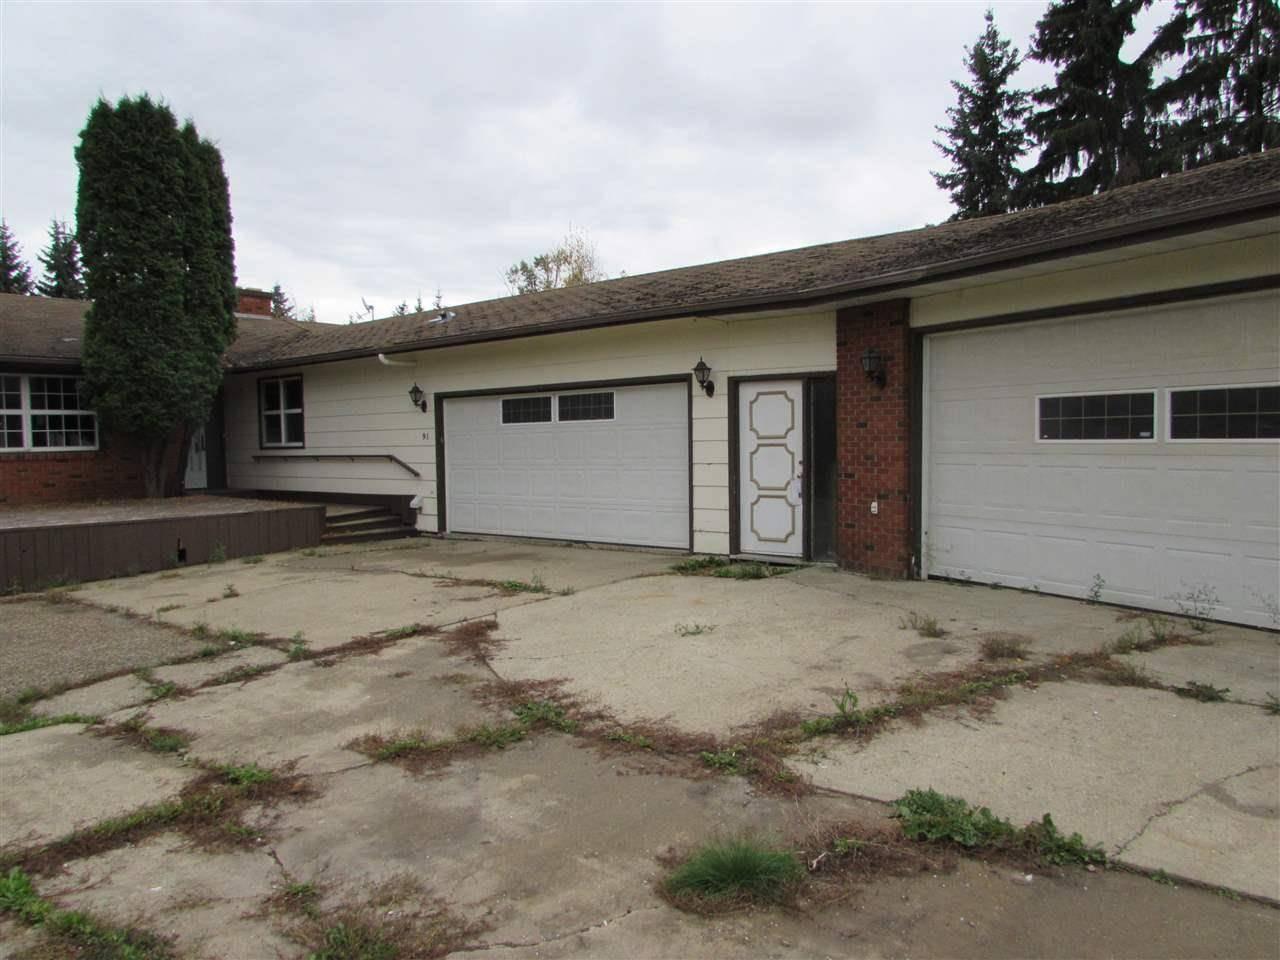 House for sale at 91 Shultz Cres Rural Sturgeon County Alberta - MLS: E4175419